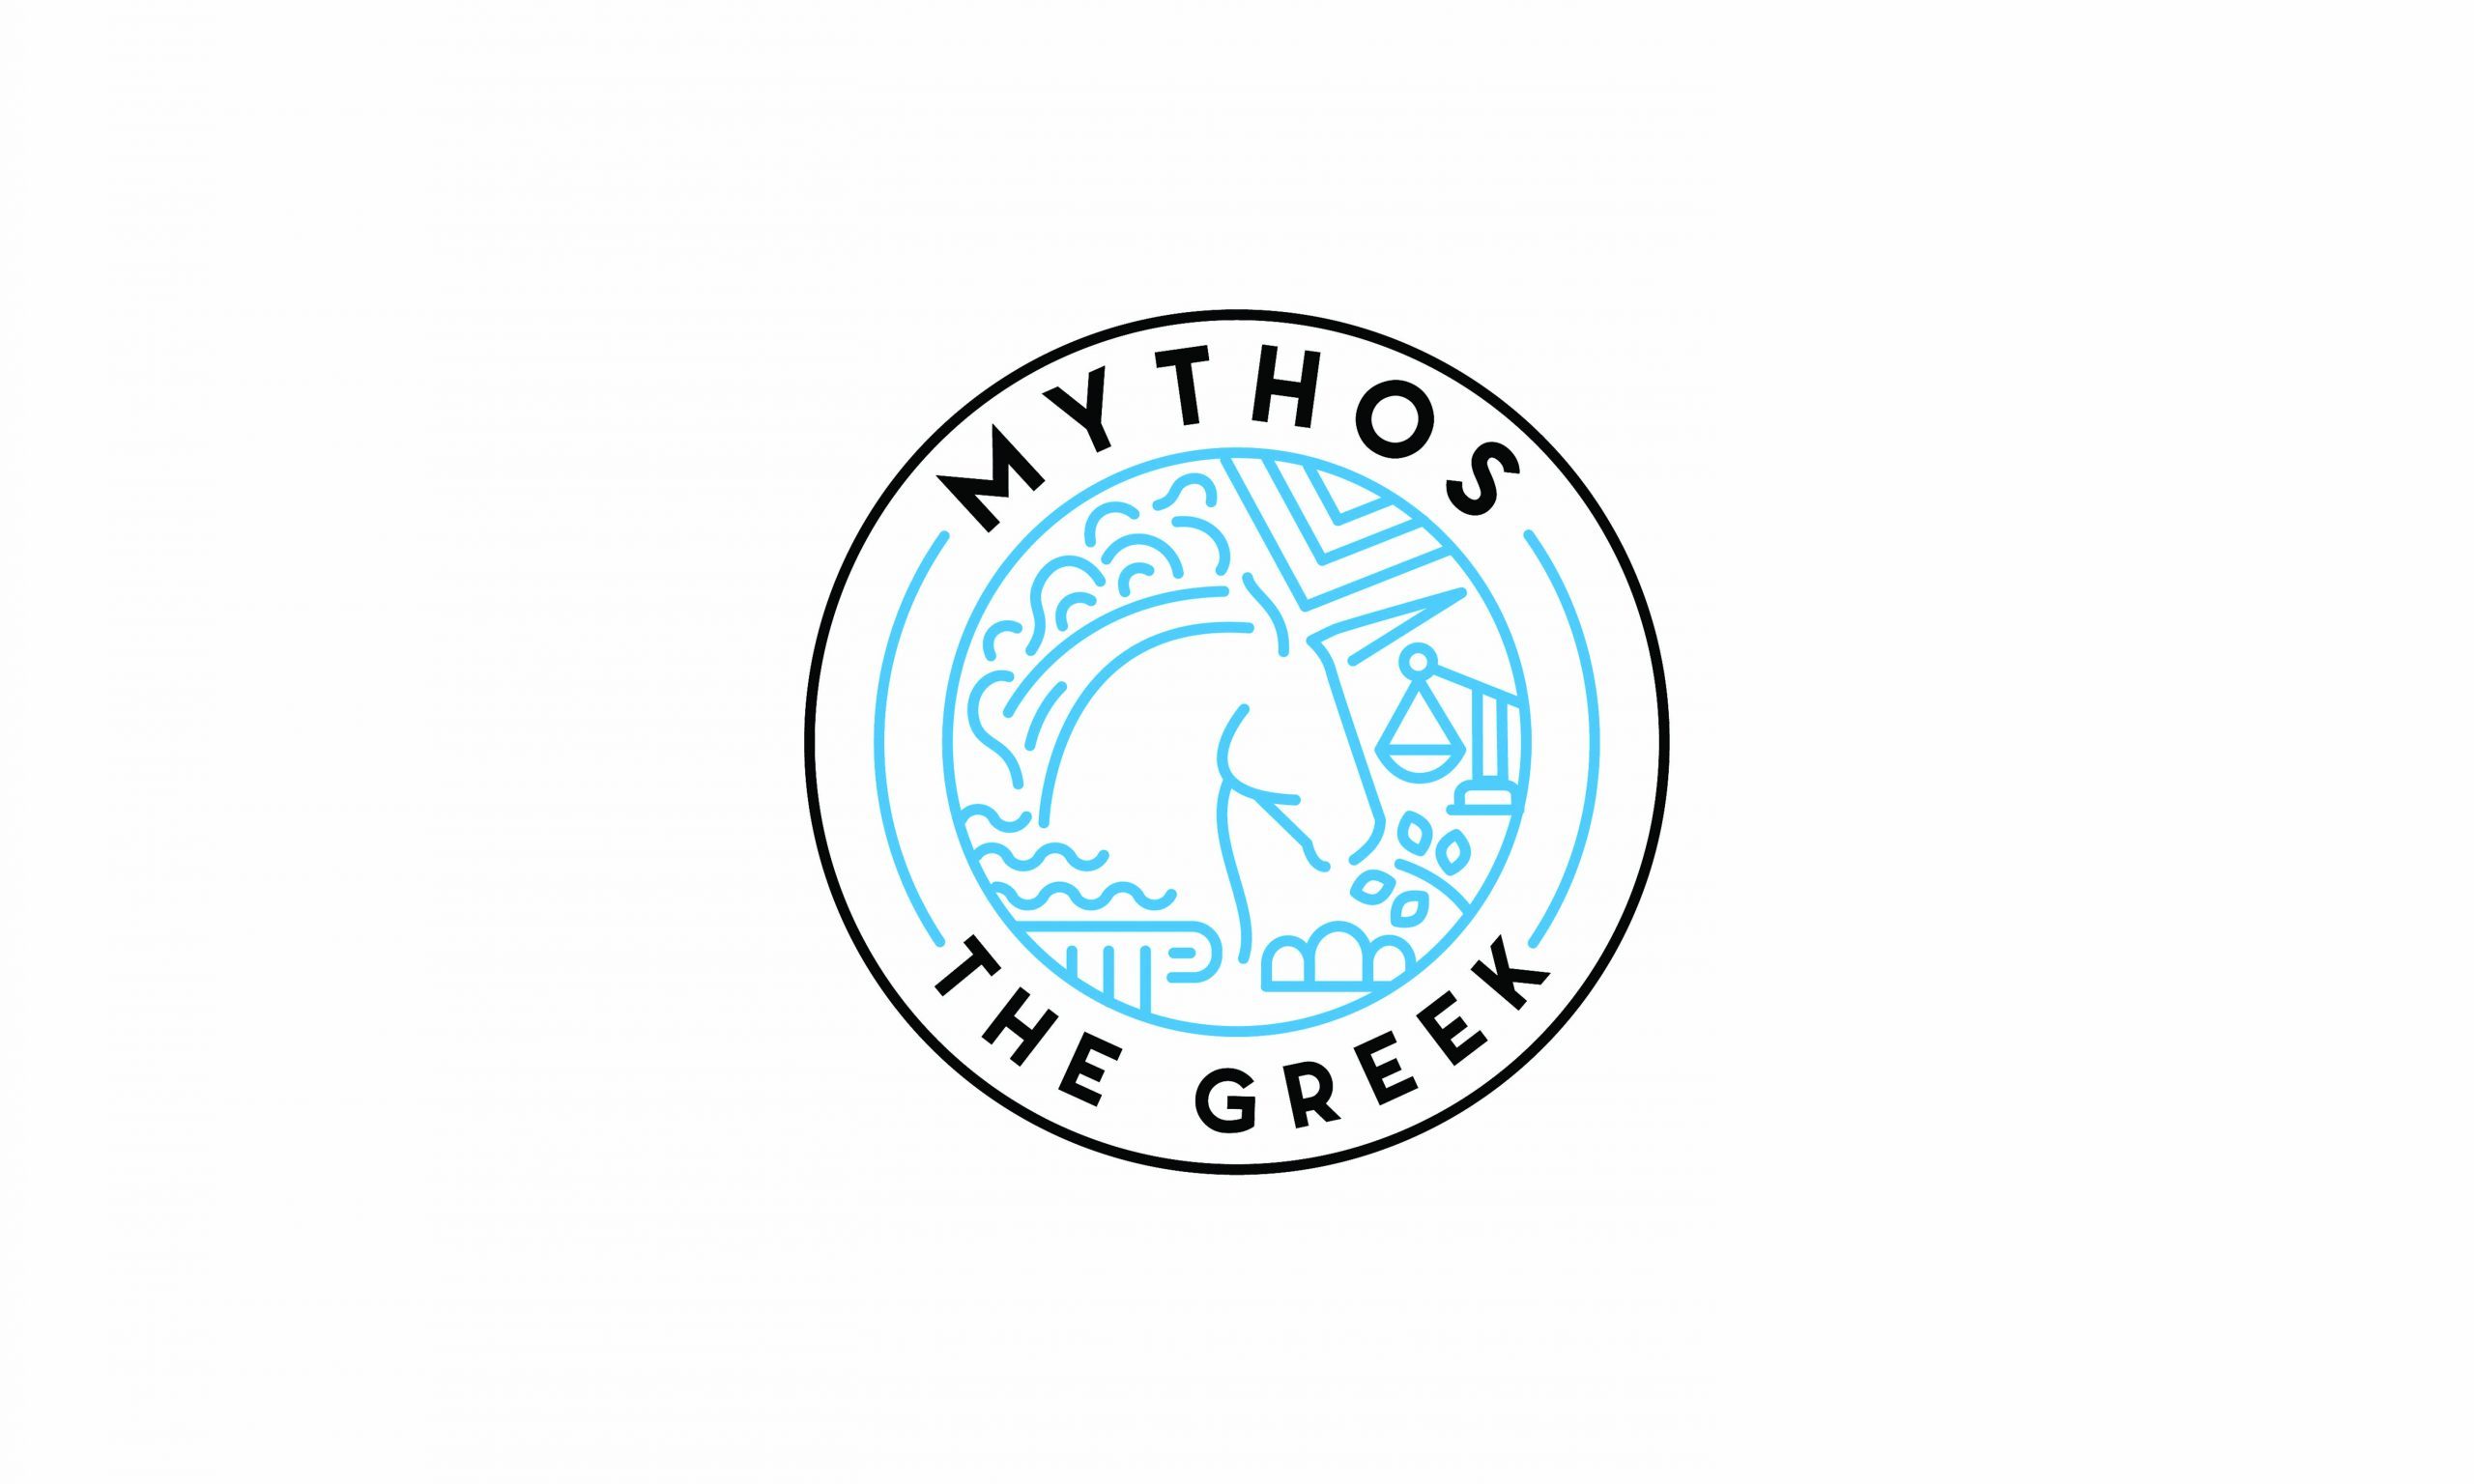 mythosszines